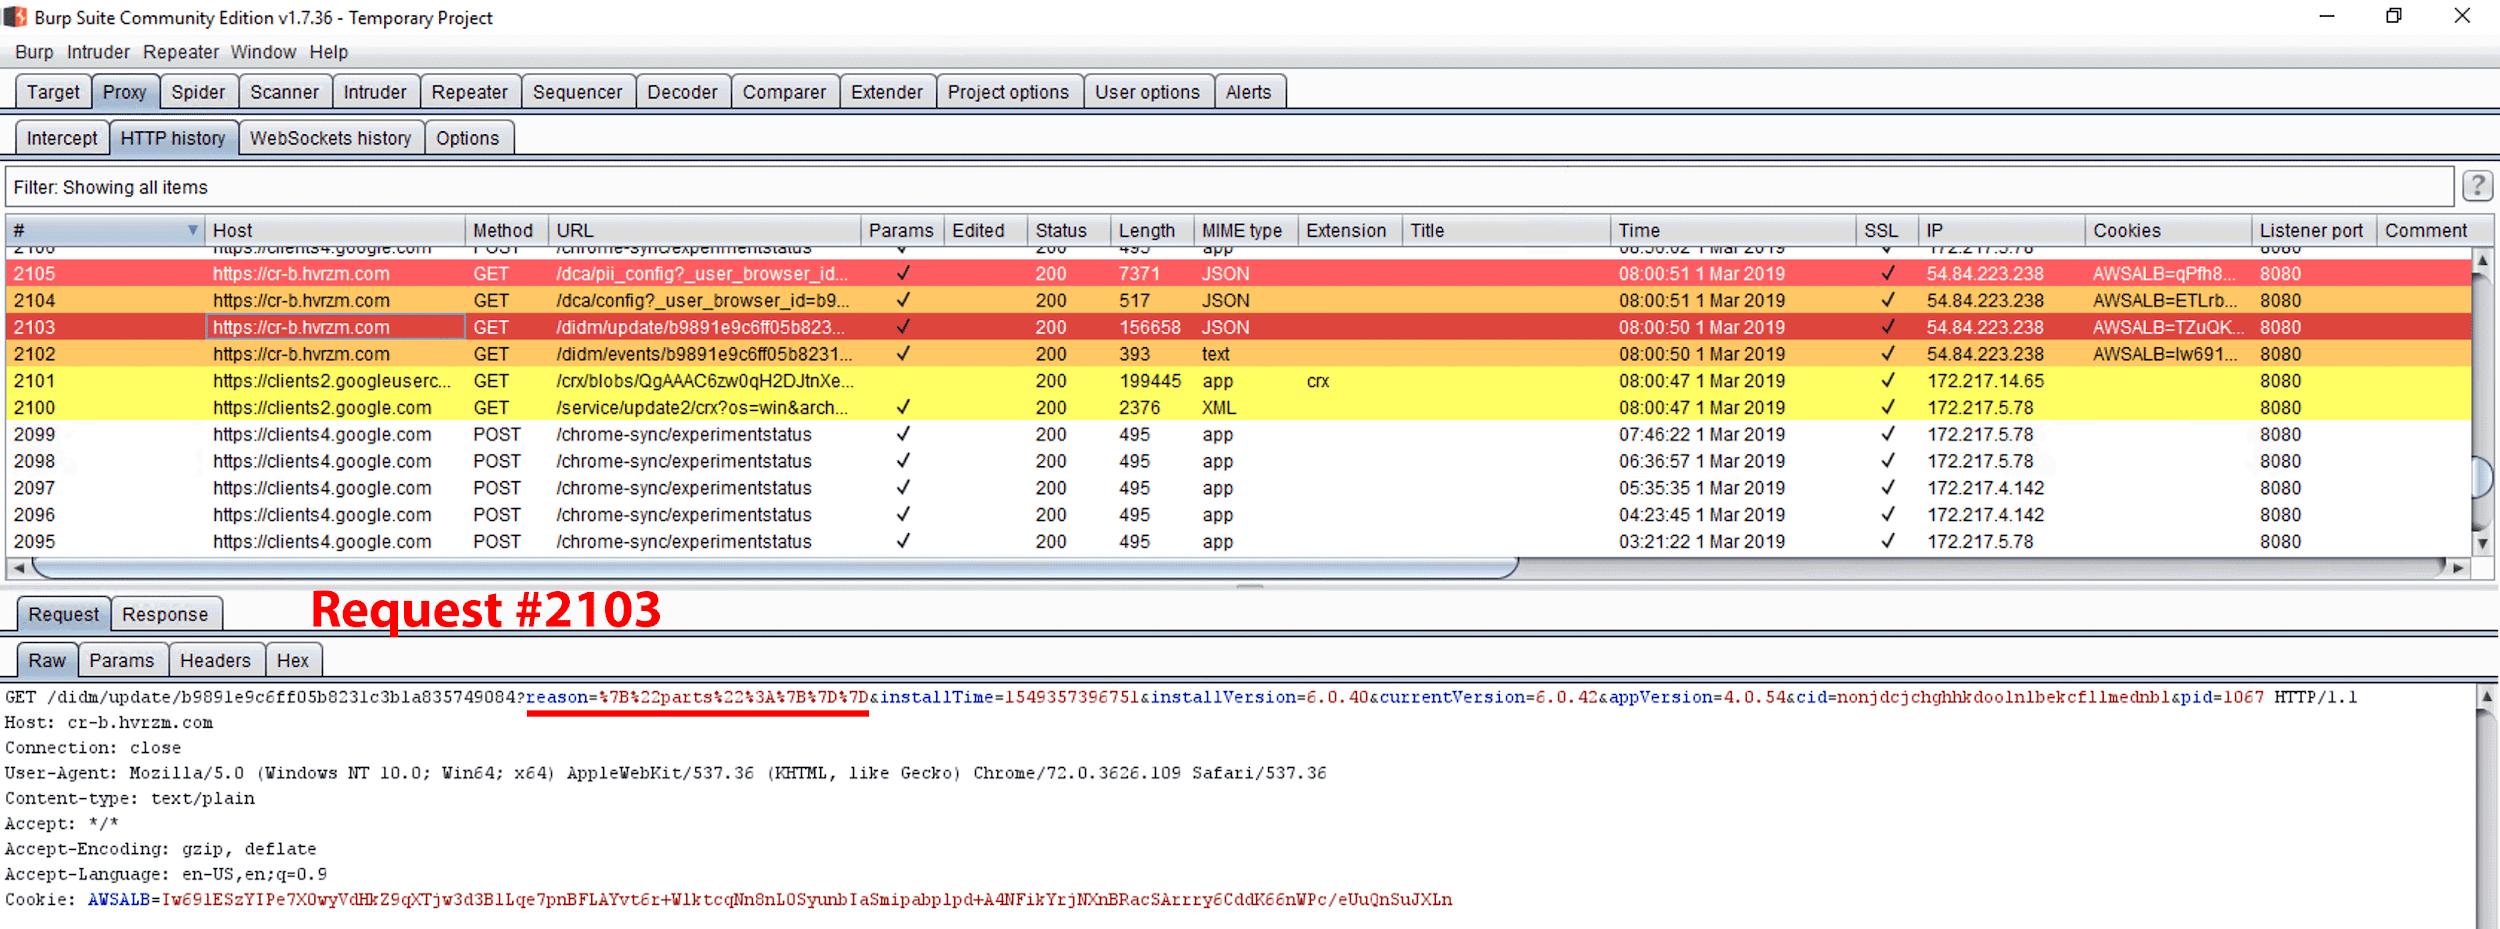 DataSpii - A global catastrophic data leak via browser